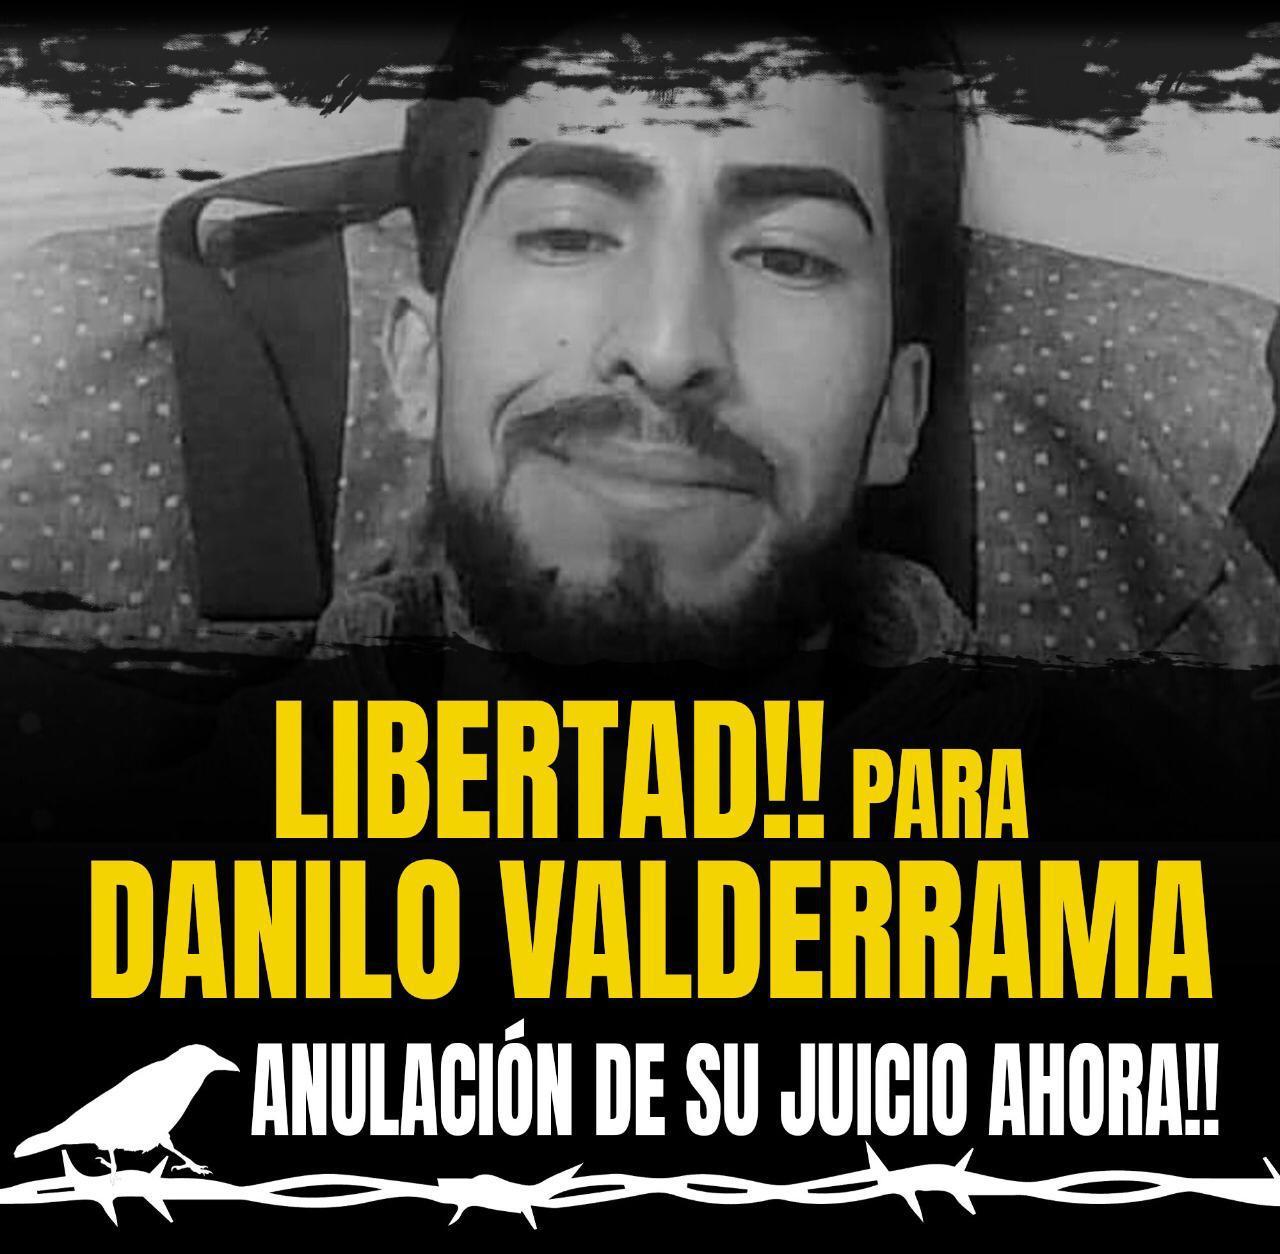 Libertad para Danilo Valderrama, #sincondiciones